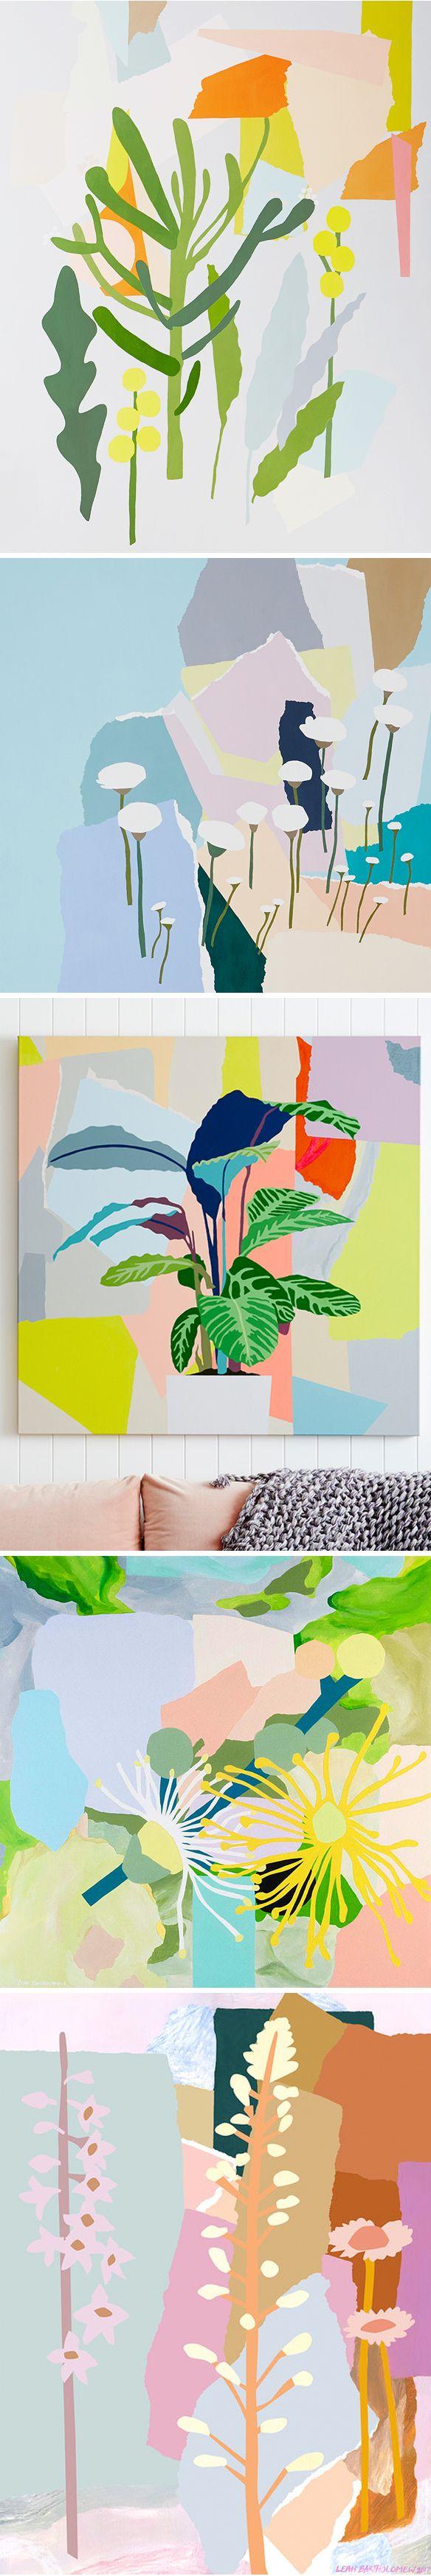 paintings by leah bartholomew